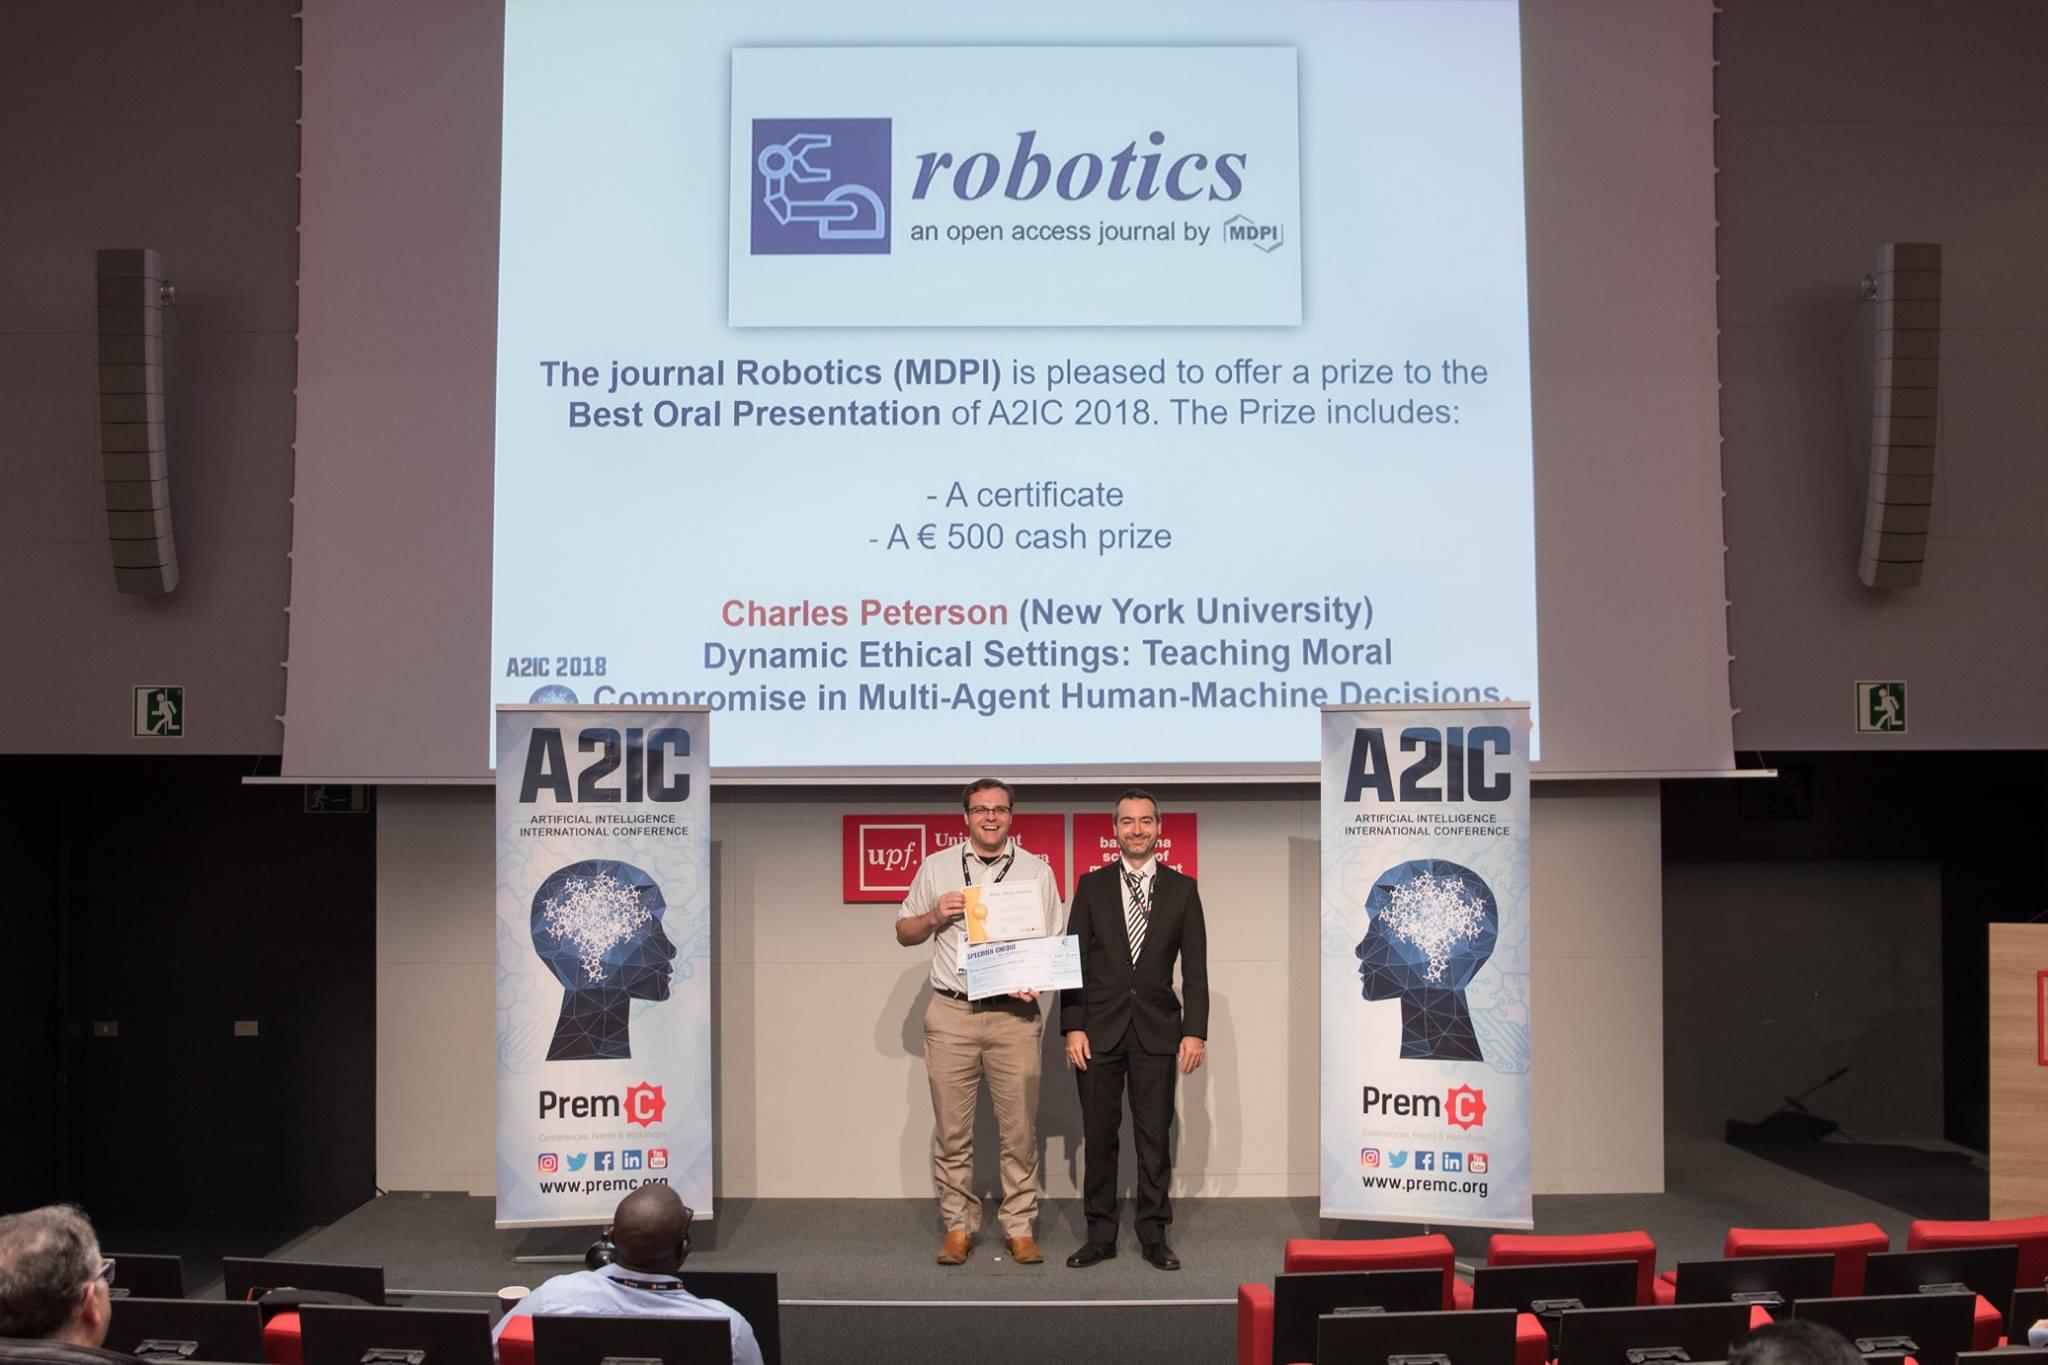 Nanophotonics and Micro/Nano Optics International Conference 2017 Auditorium